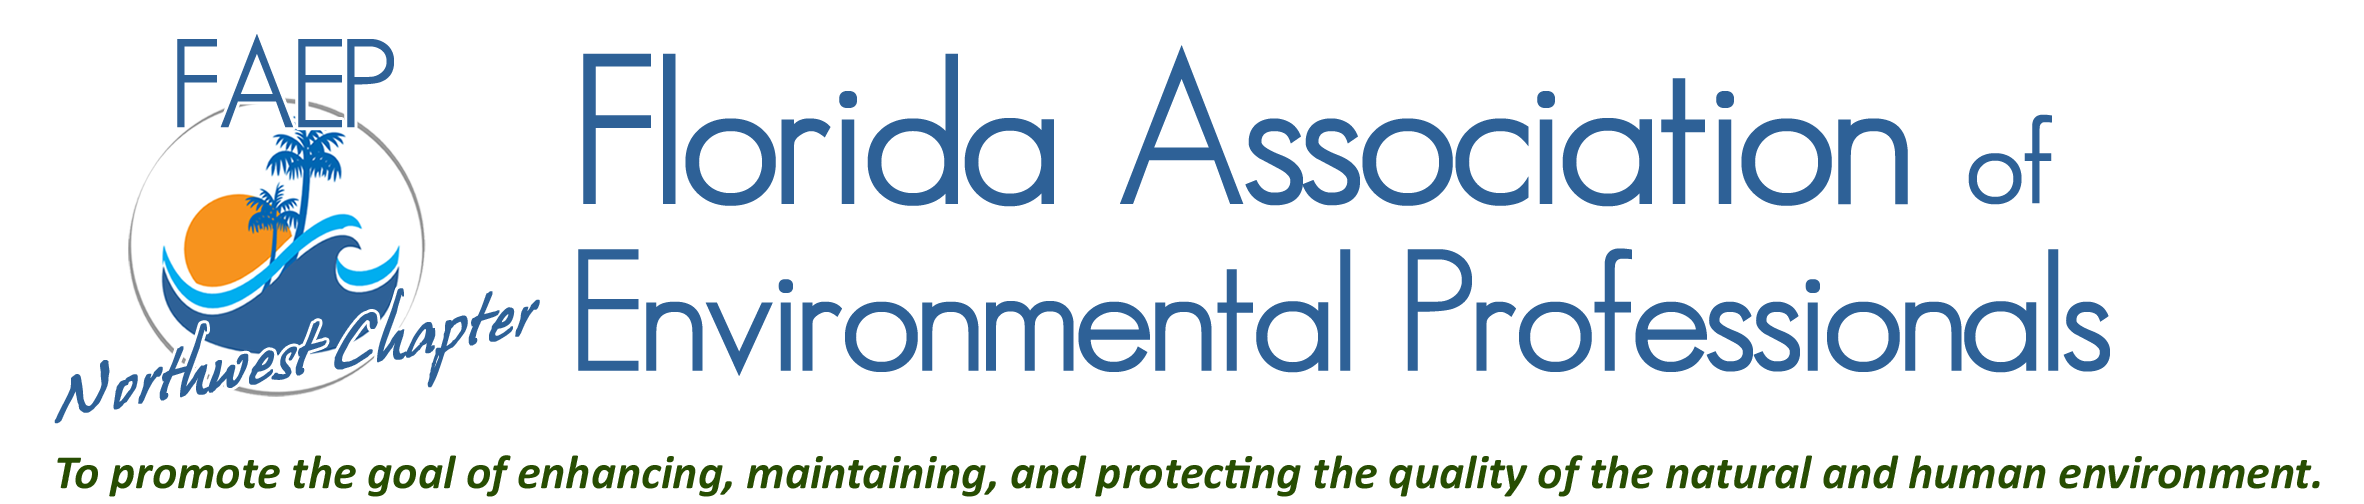 Florida Association of Environmental Professionals – Northwest Chapter